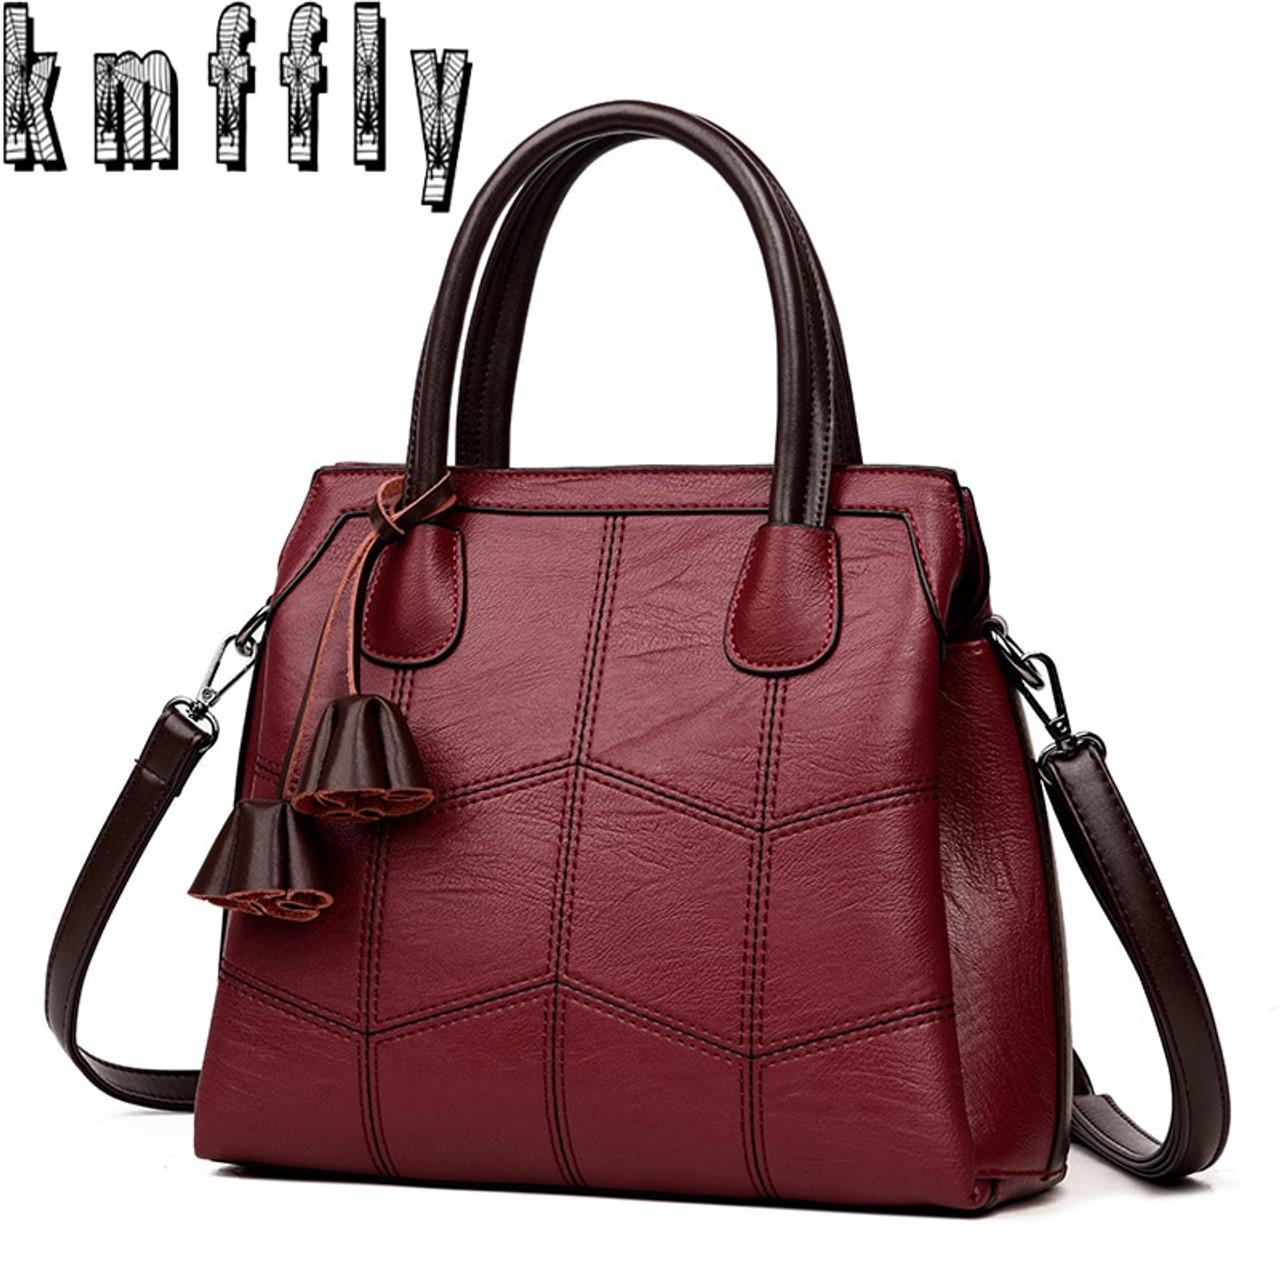 61e296b16b8 KMFFLY Brand Women Bags 2018 Fashion Leather Bags Women Handbags High  Quality Luxury Brand Shoulder Bags ...